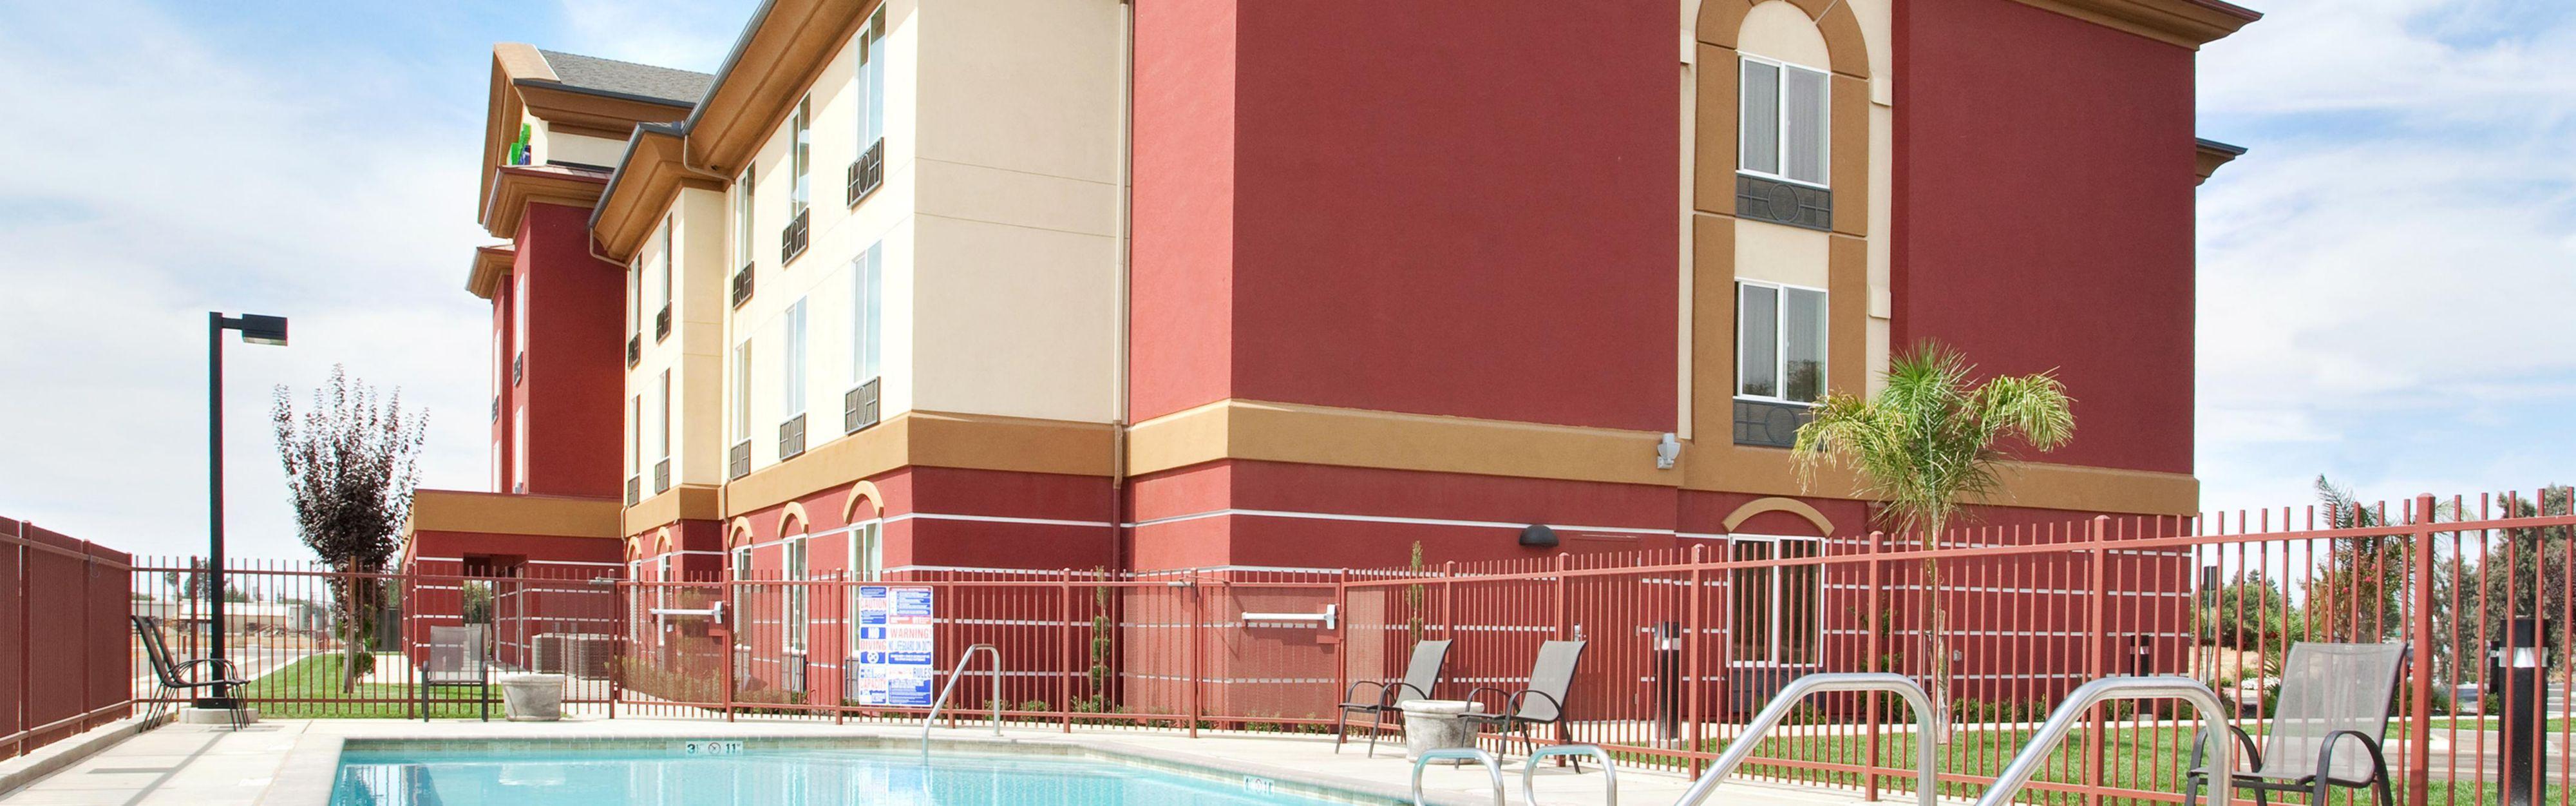 Holiday Inn Express & Suites Chowchilla - Yosemite Pk Area image 2